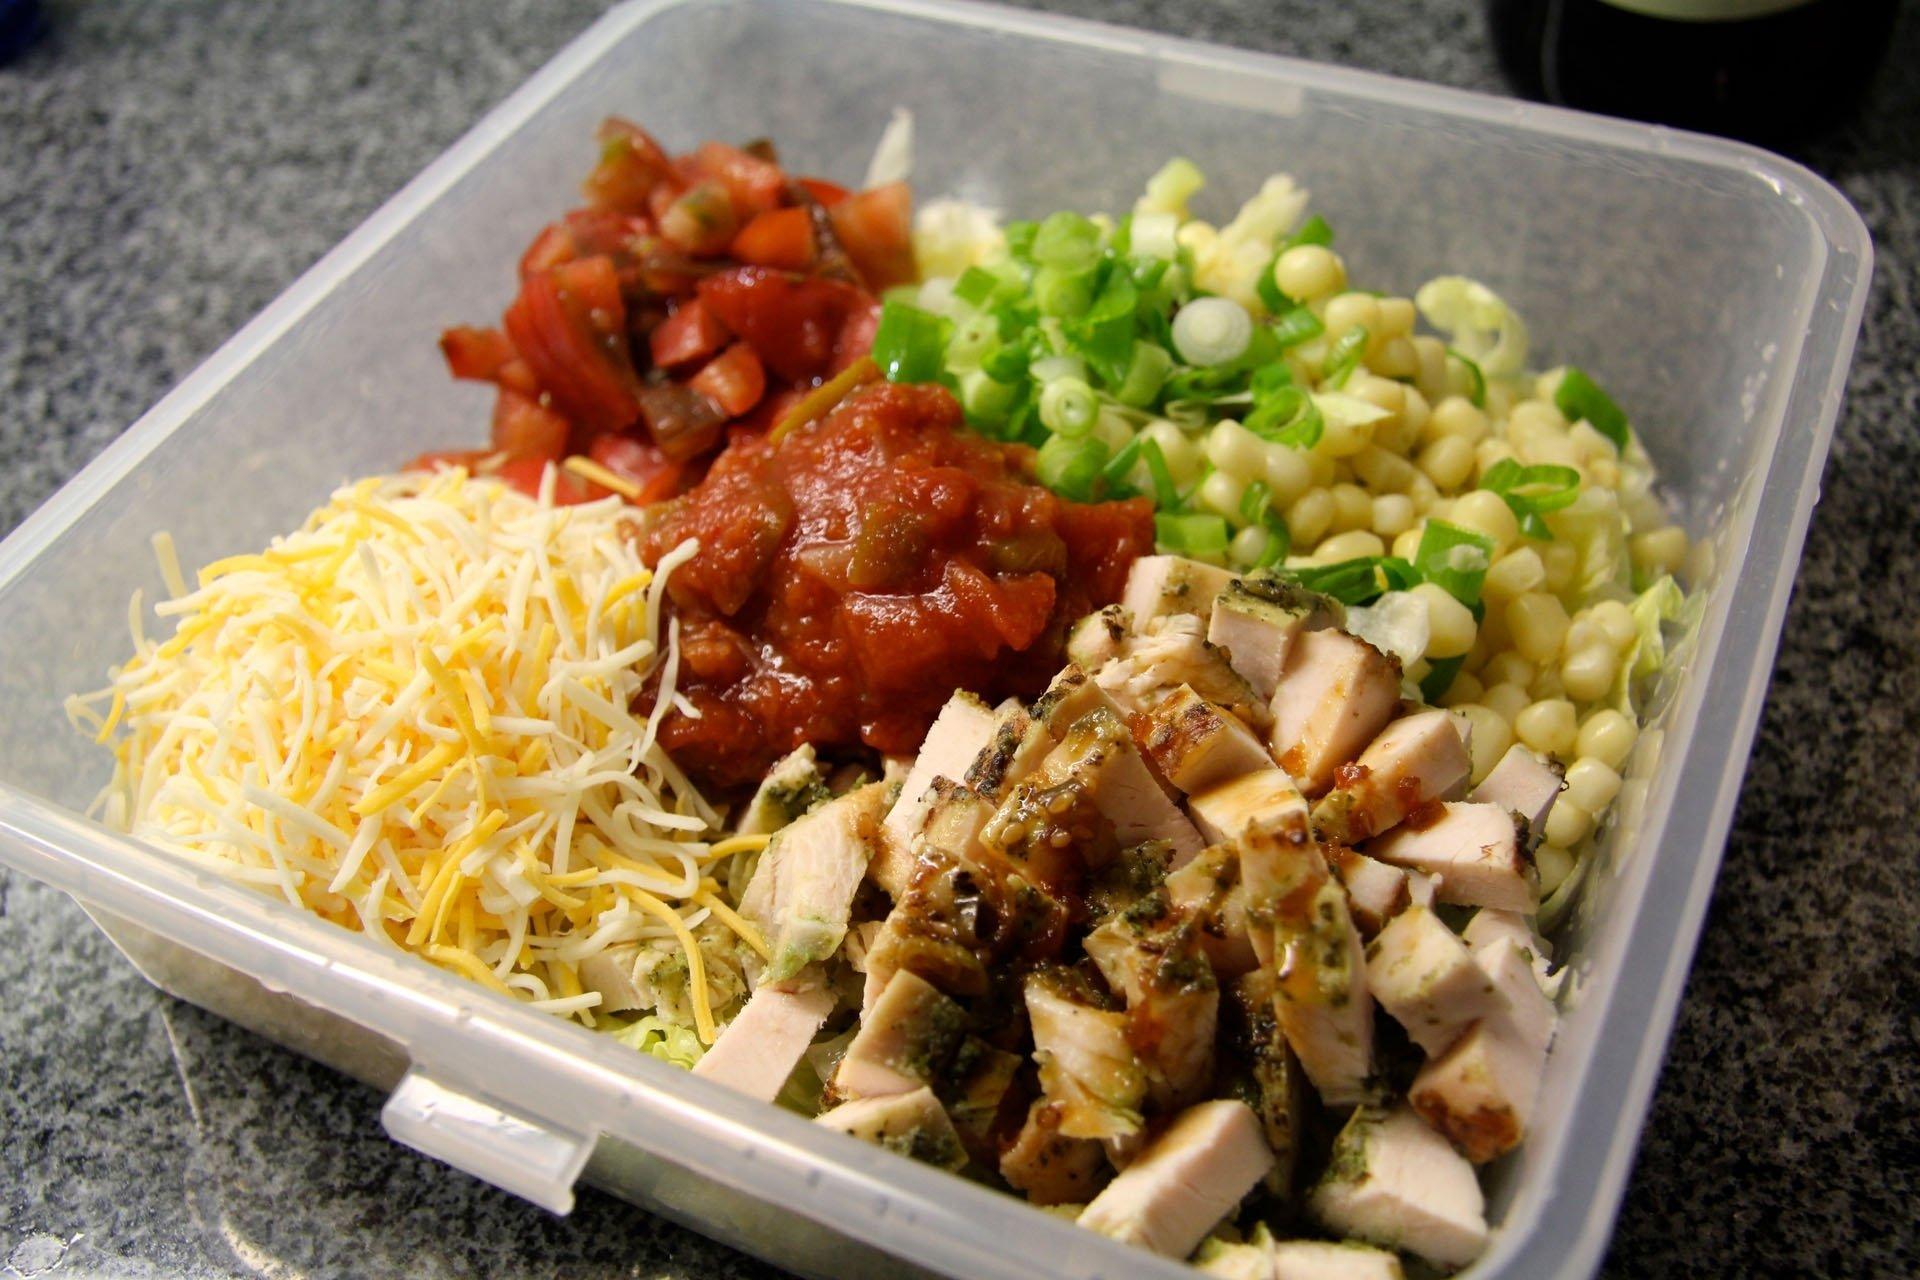 healthy lunch box ideas - fangalicious